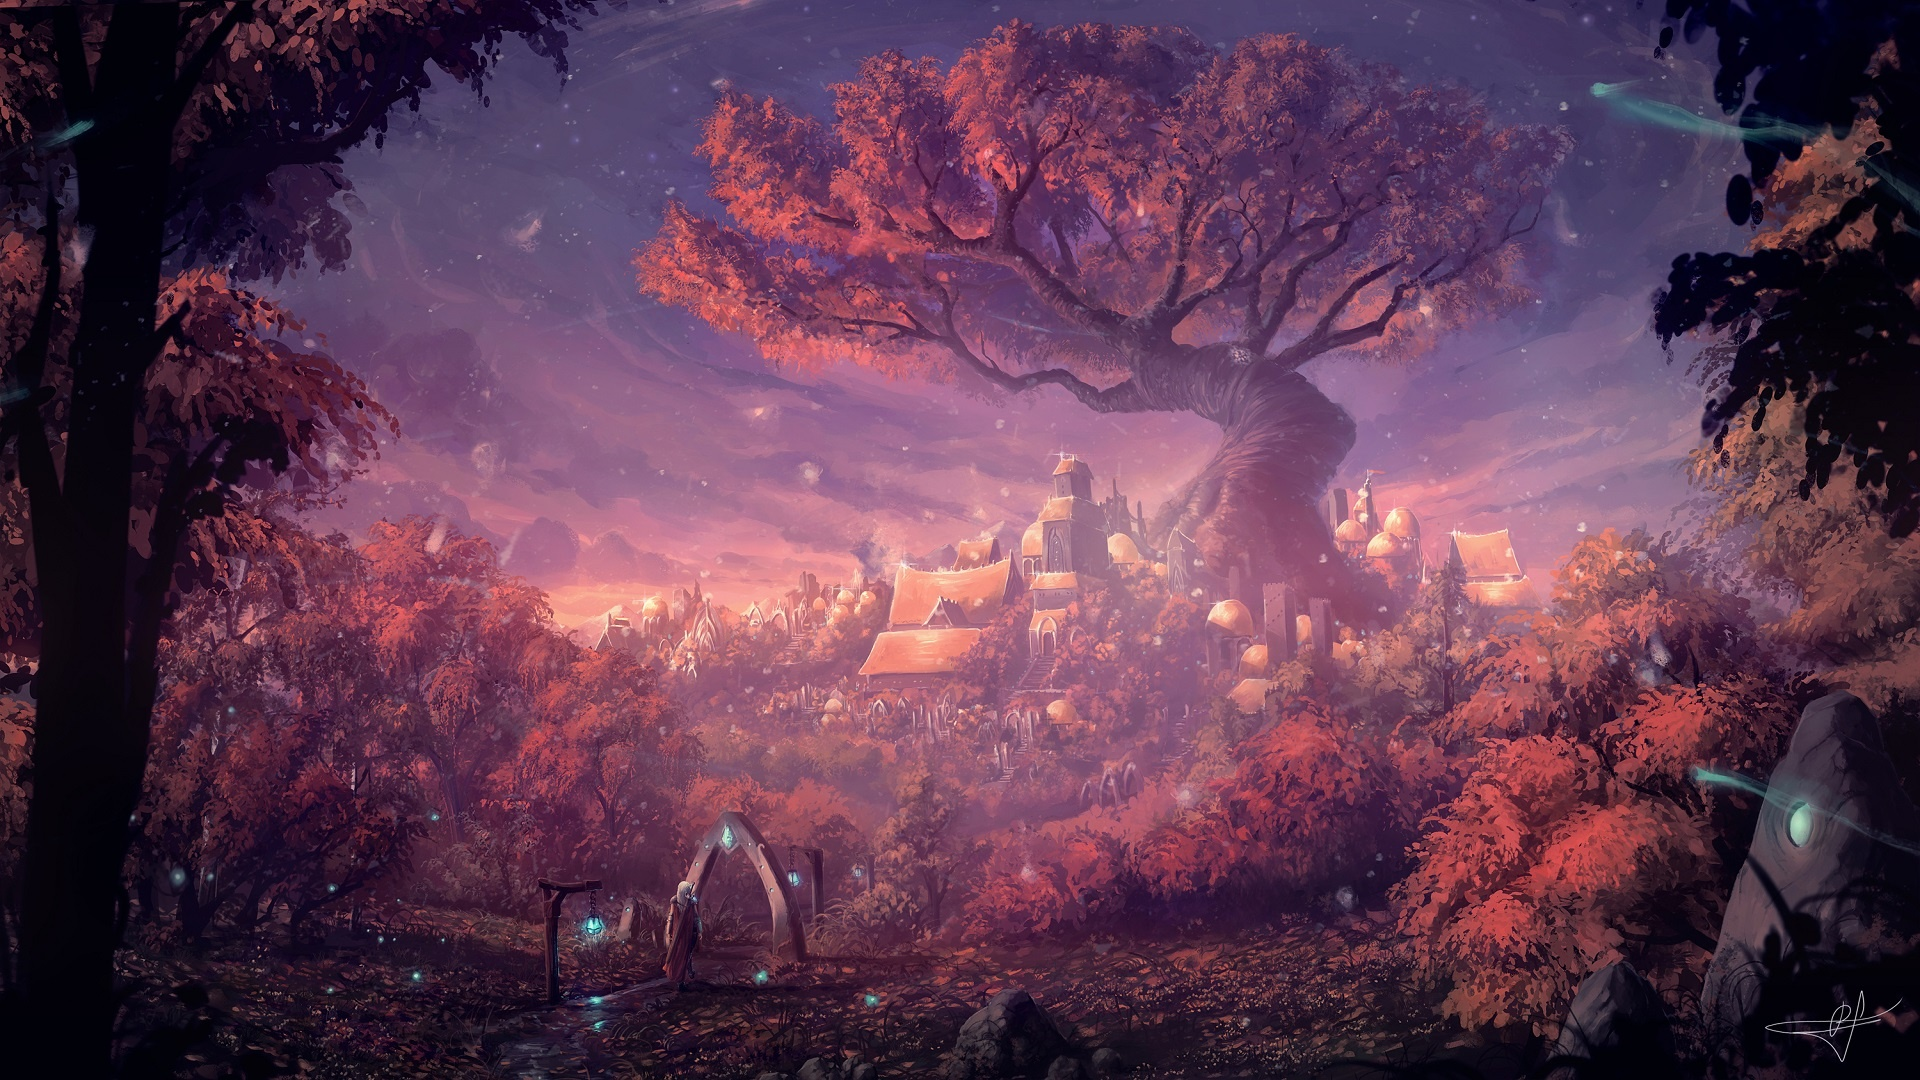 Fantasy Landsсape pc wallpaper